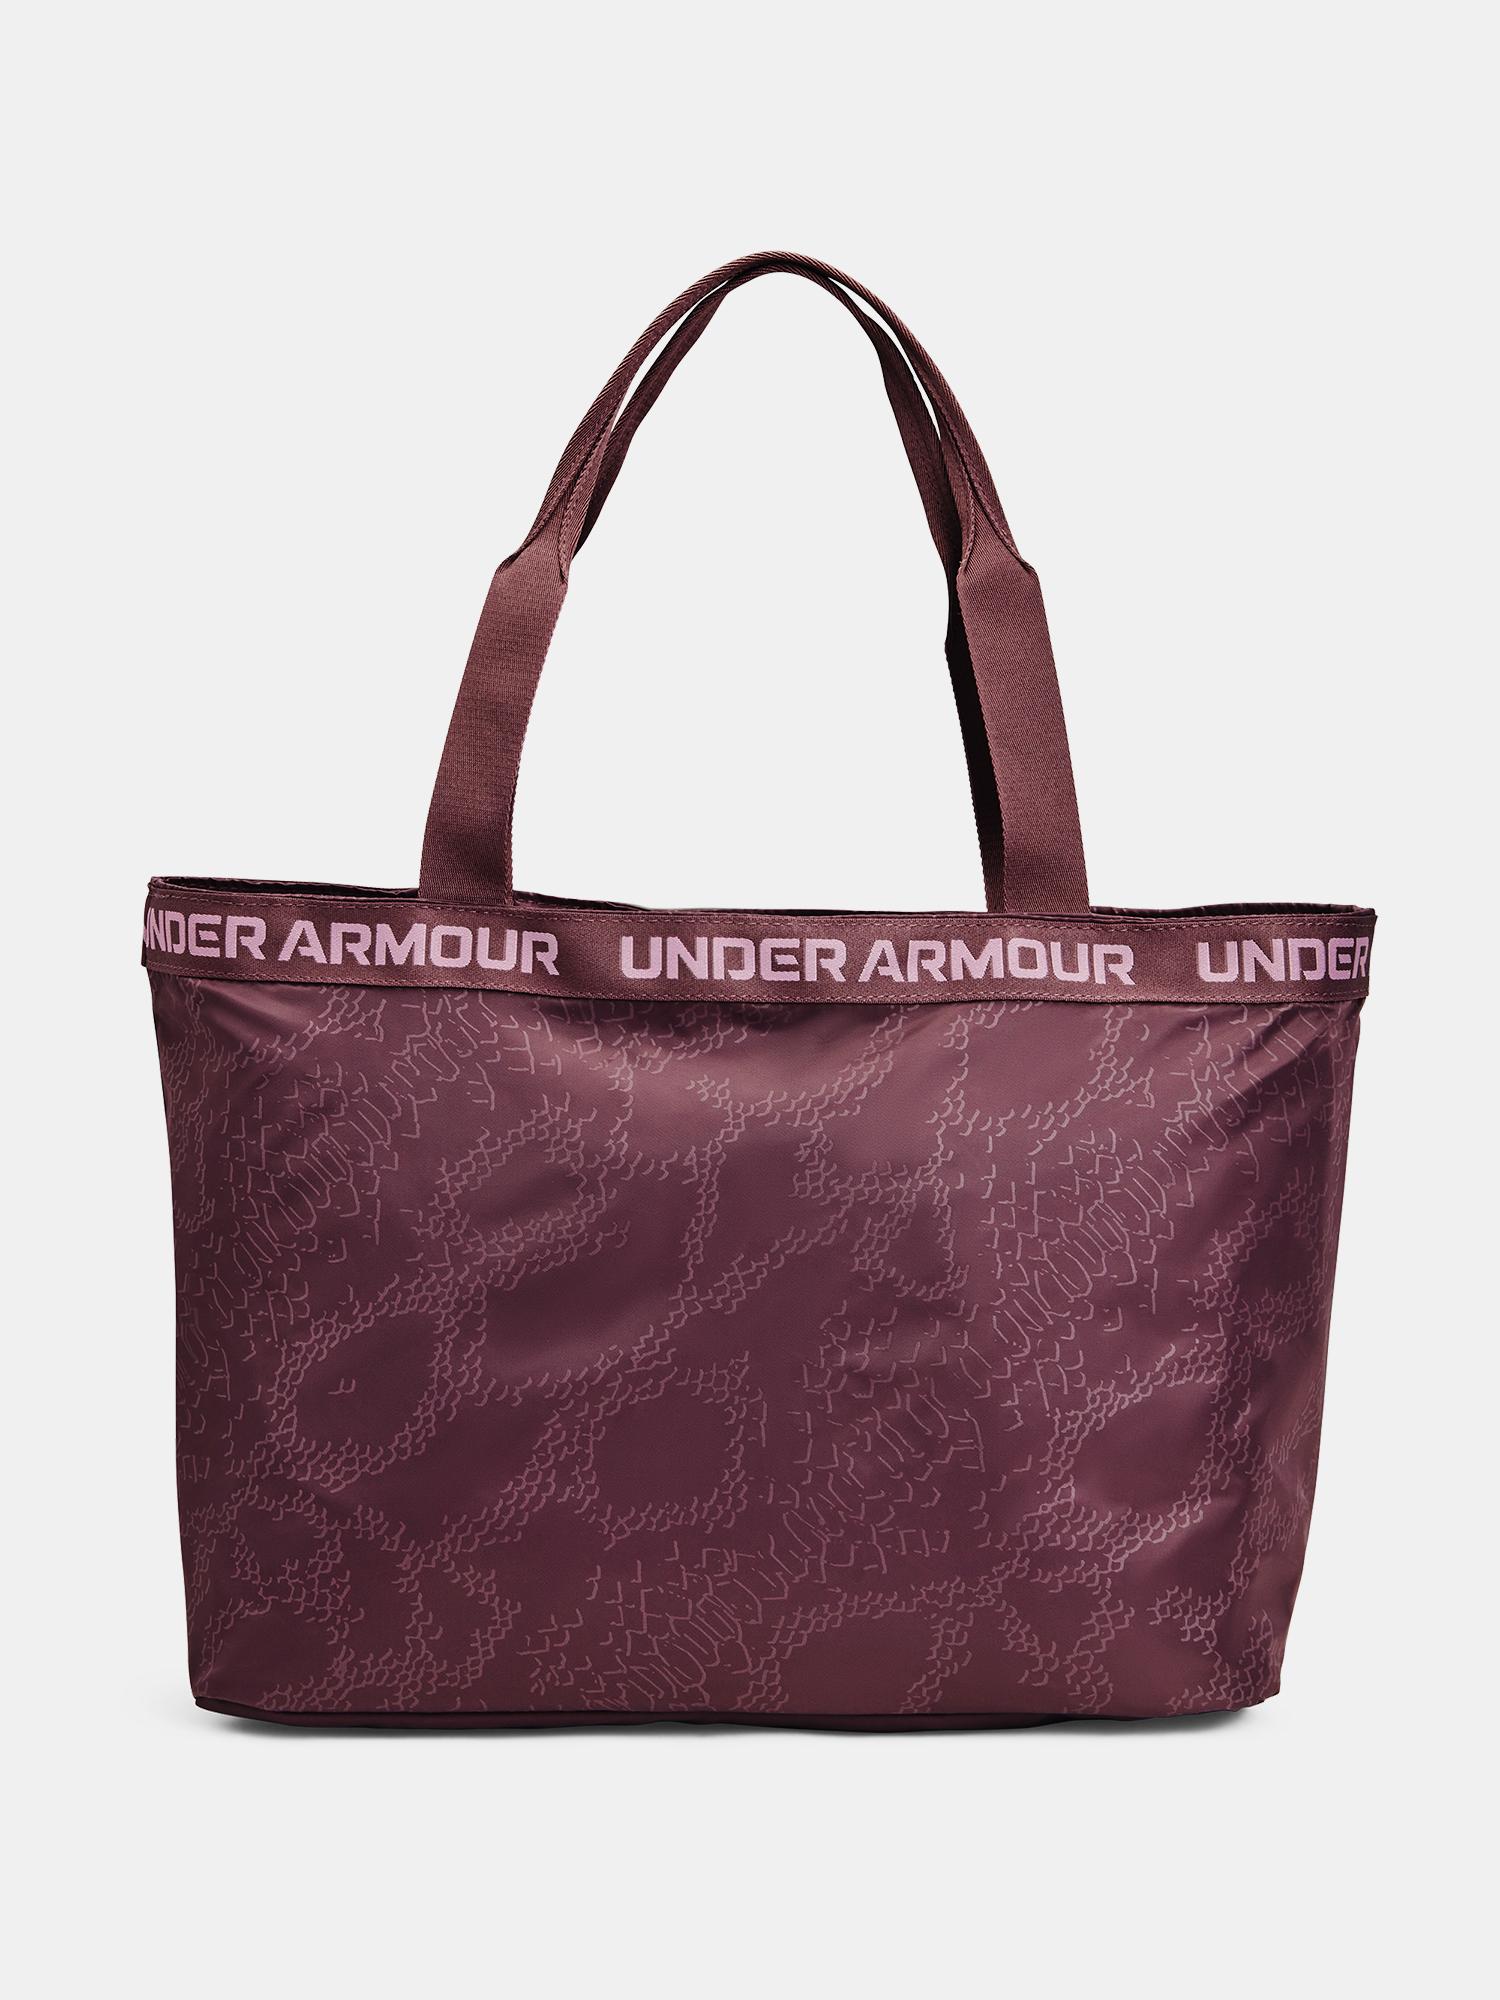 Under Armour Borsa donna viola